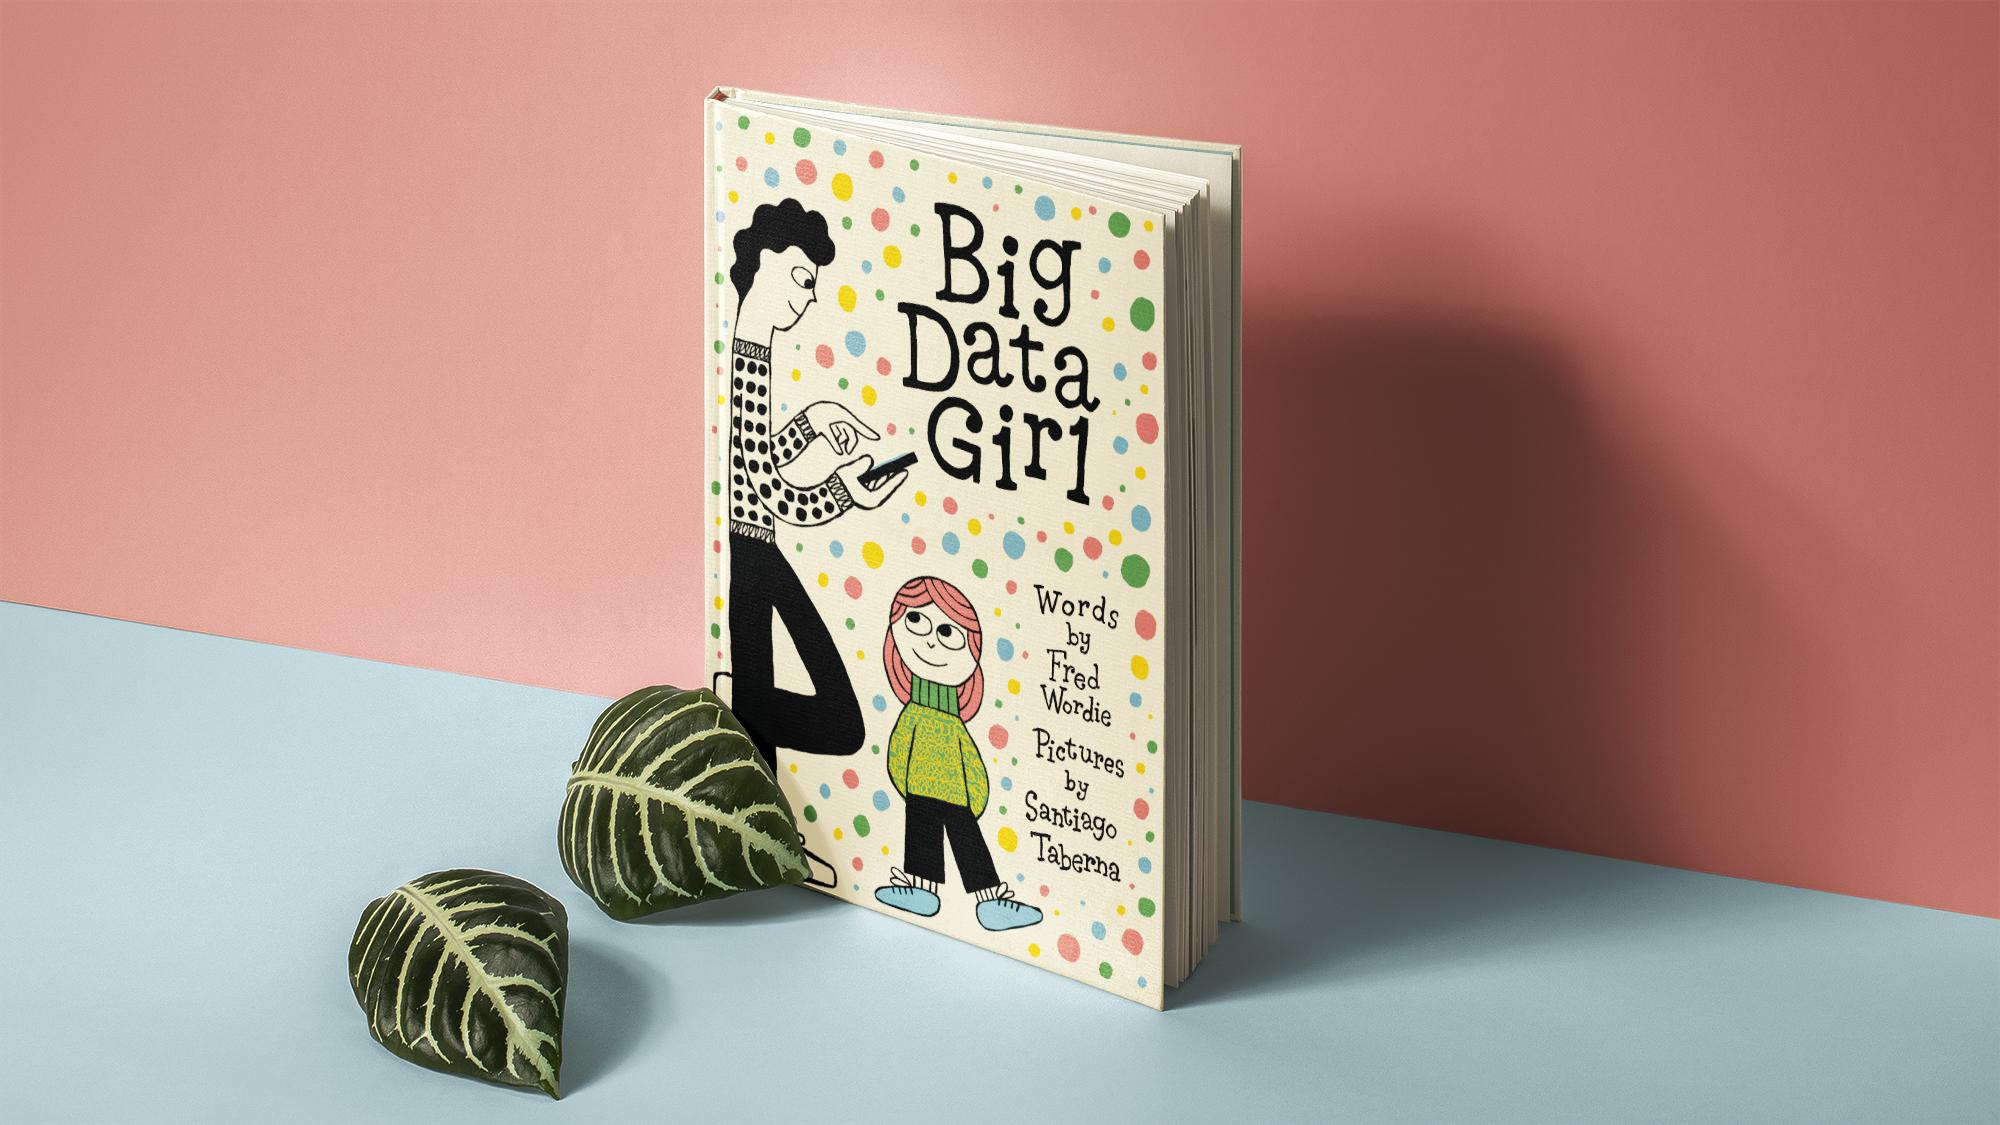 A Children's Book about Big Data